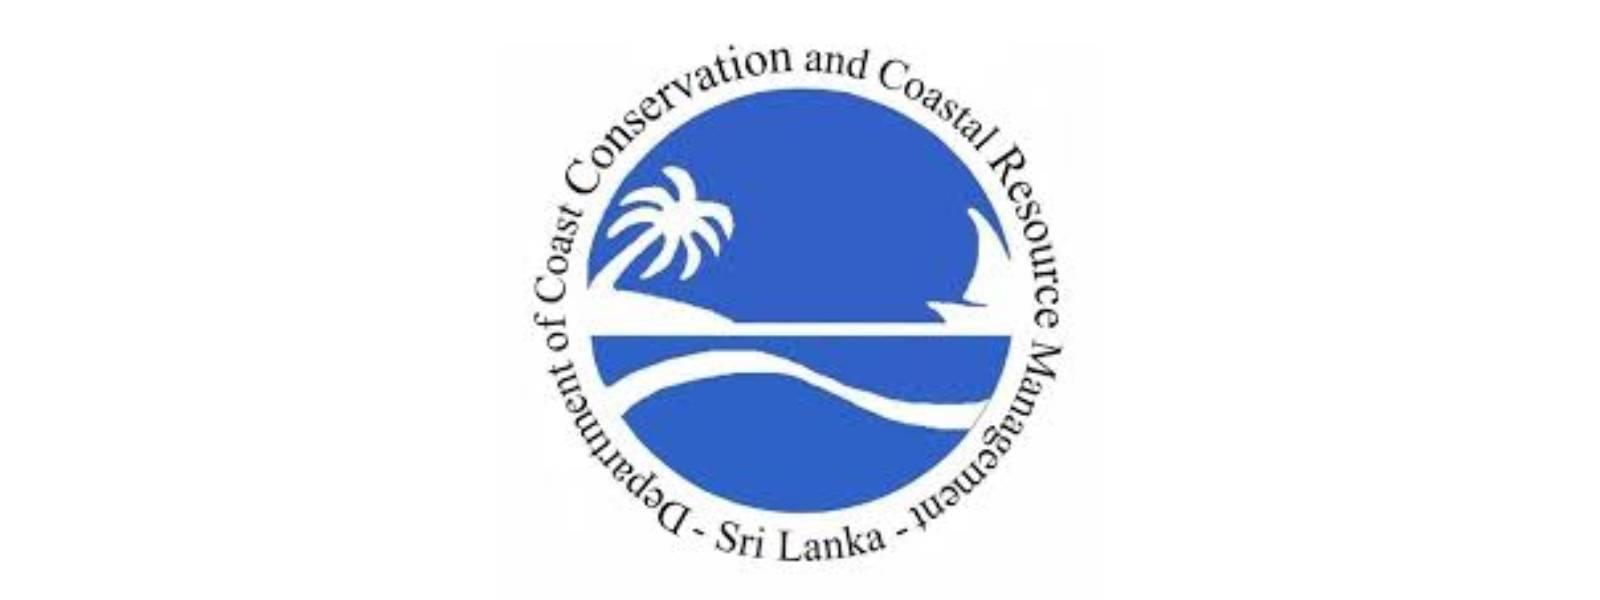 Sri Lanka's coastal body defends beach nourishment projects